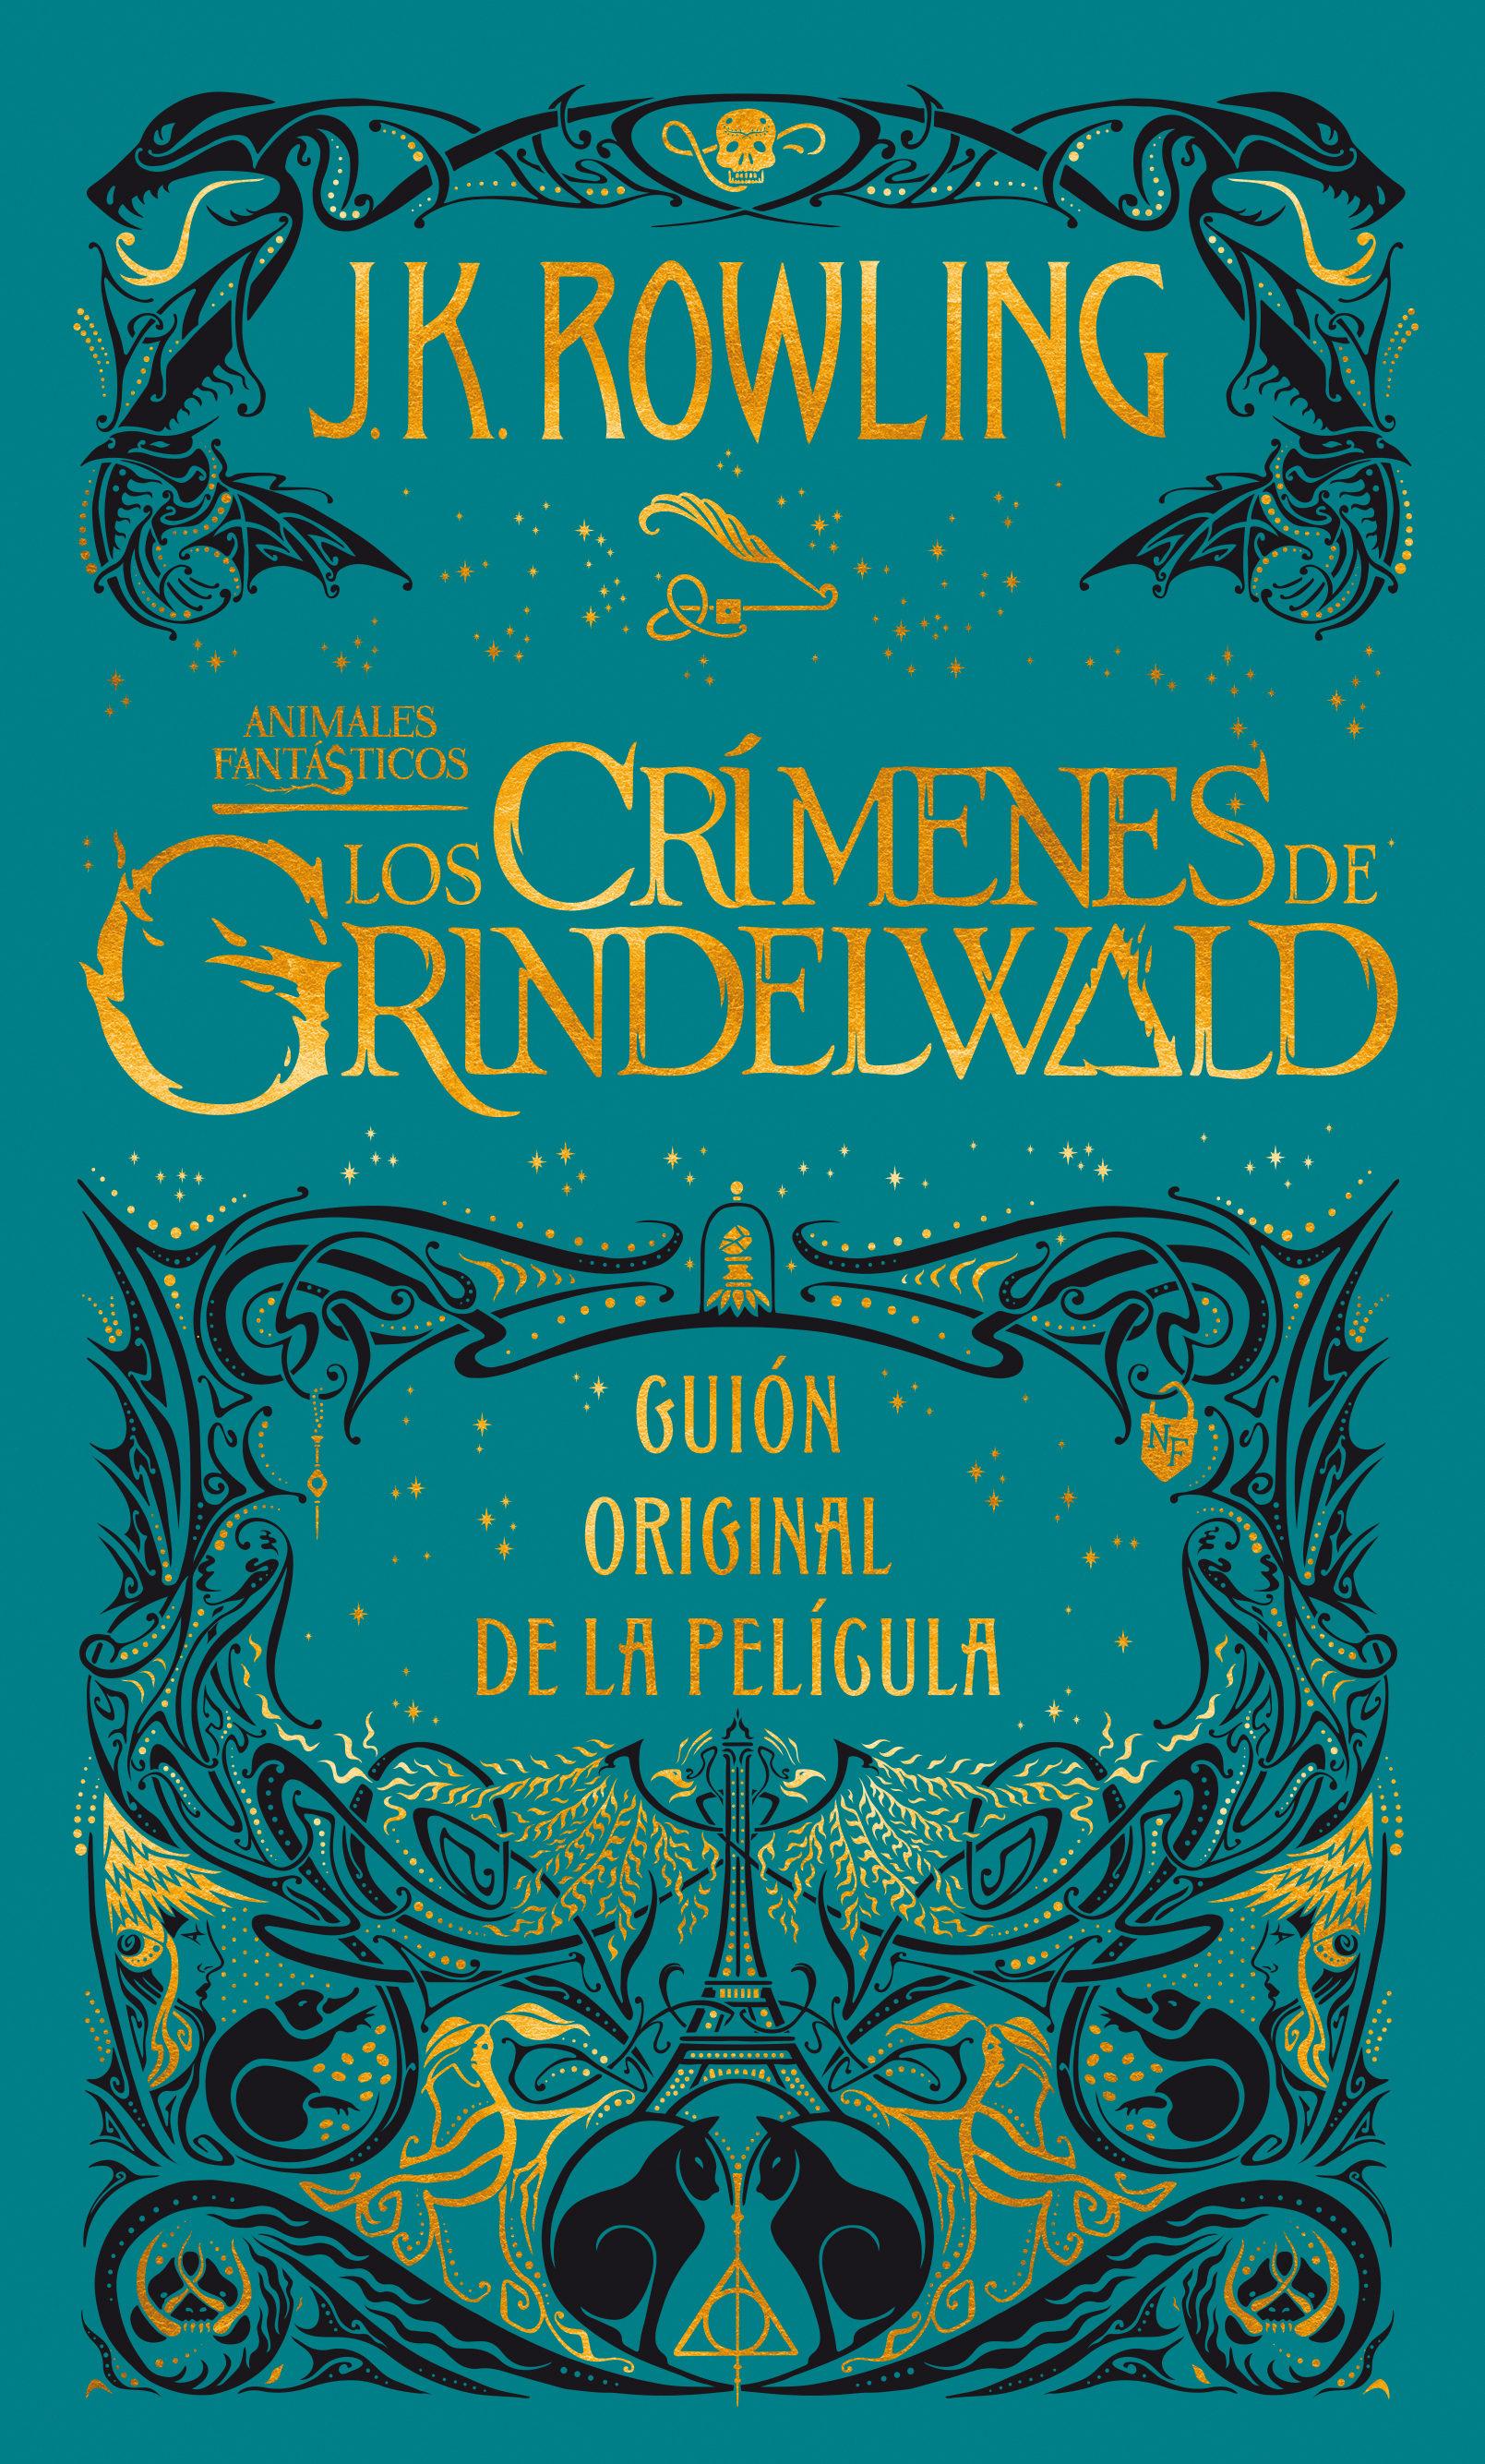 Crimenes de Grindelwald, los (Guion Cinematografico Animales Fantasticos 2) (Animales Fantasticos - J. K. Rowling - Salamandra